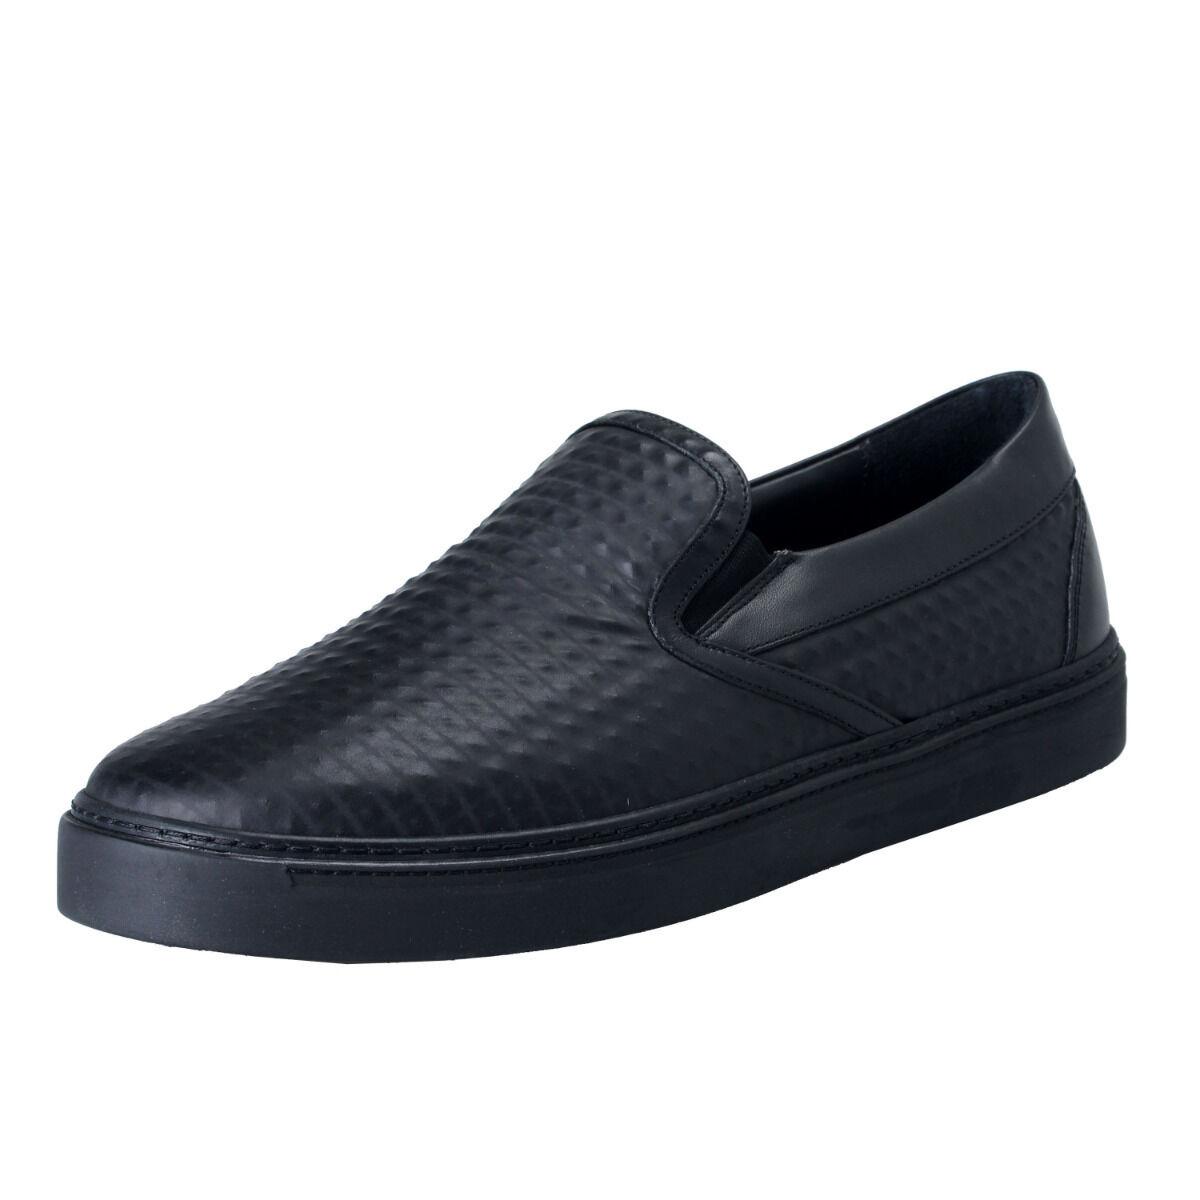 MCM Men's Black Textured Leather Moccasins Slip On Shoes Sz 8 9 10 11 12